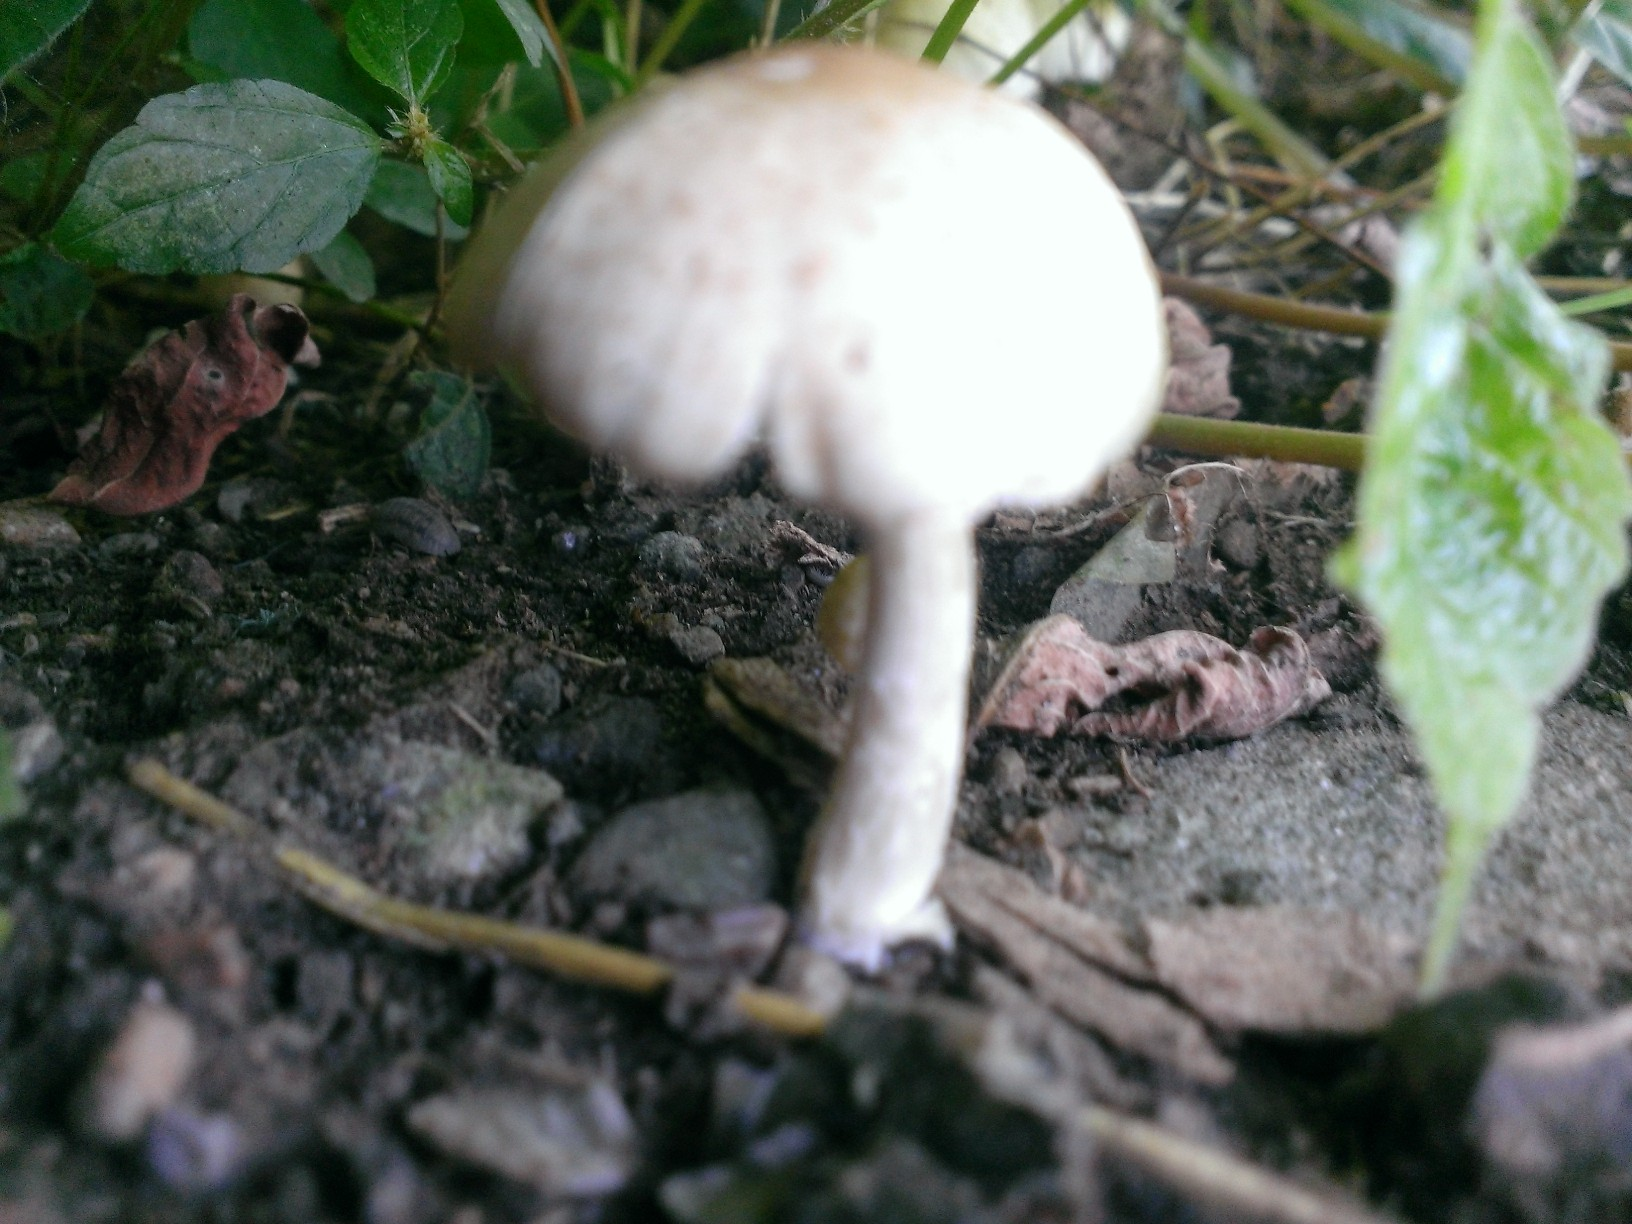 Western Pennsylvania Pittsburgh Mushroom Identification